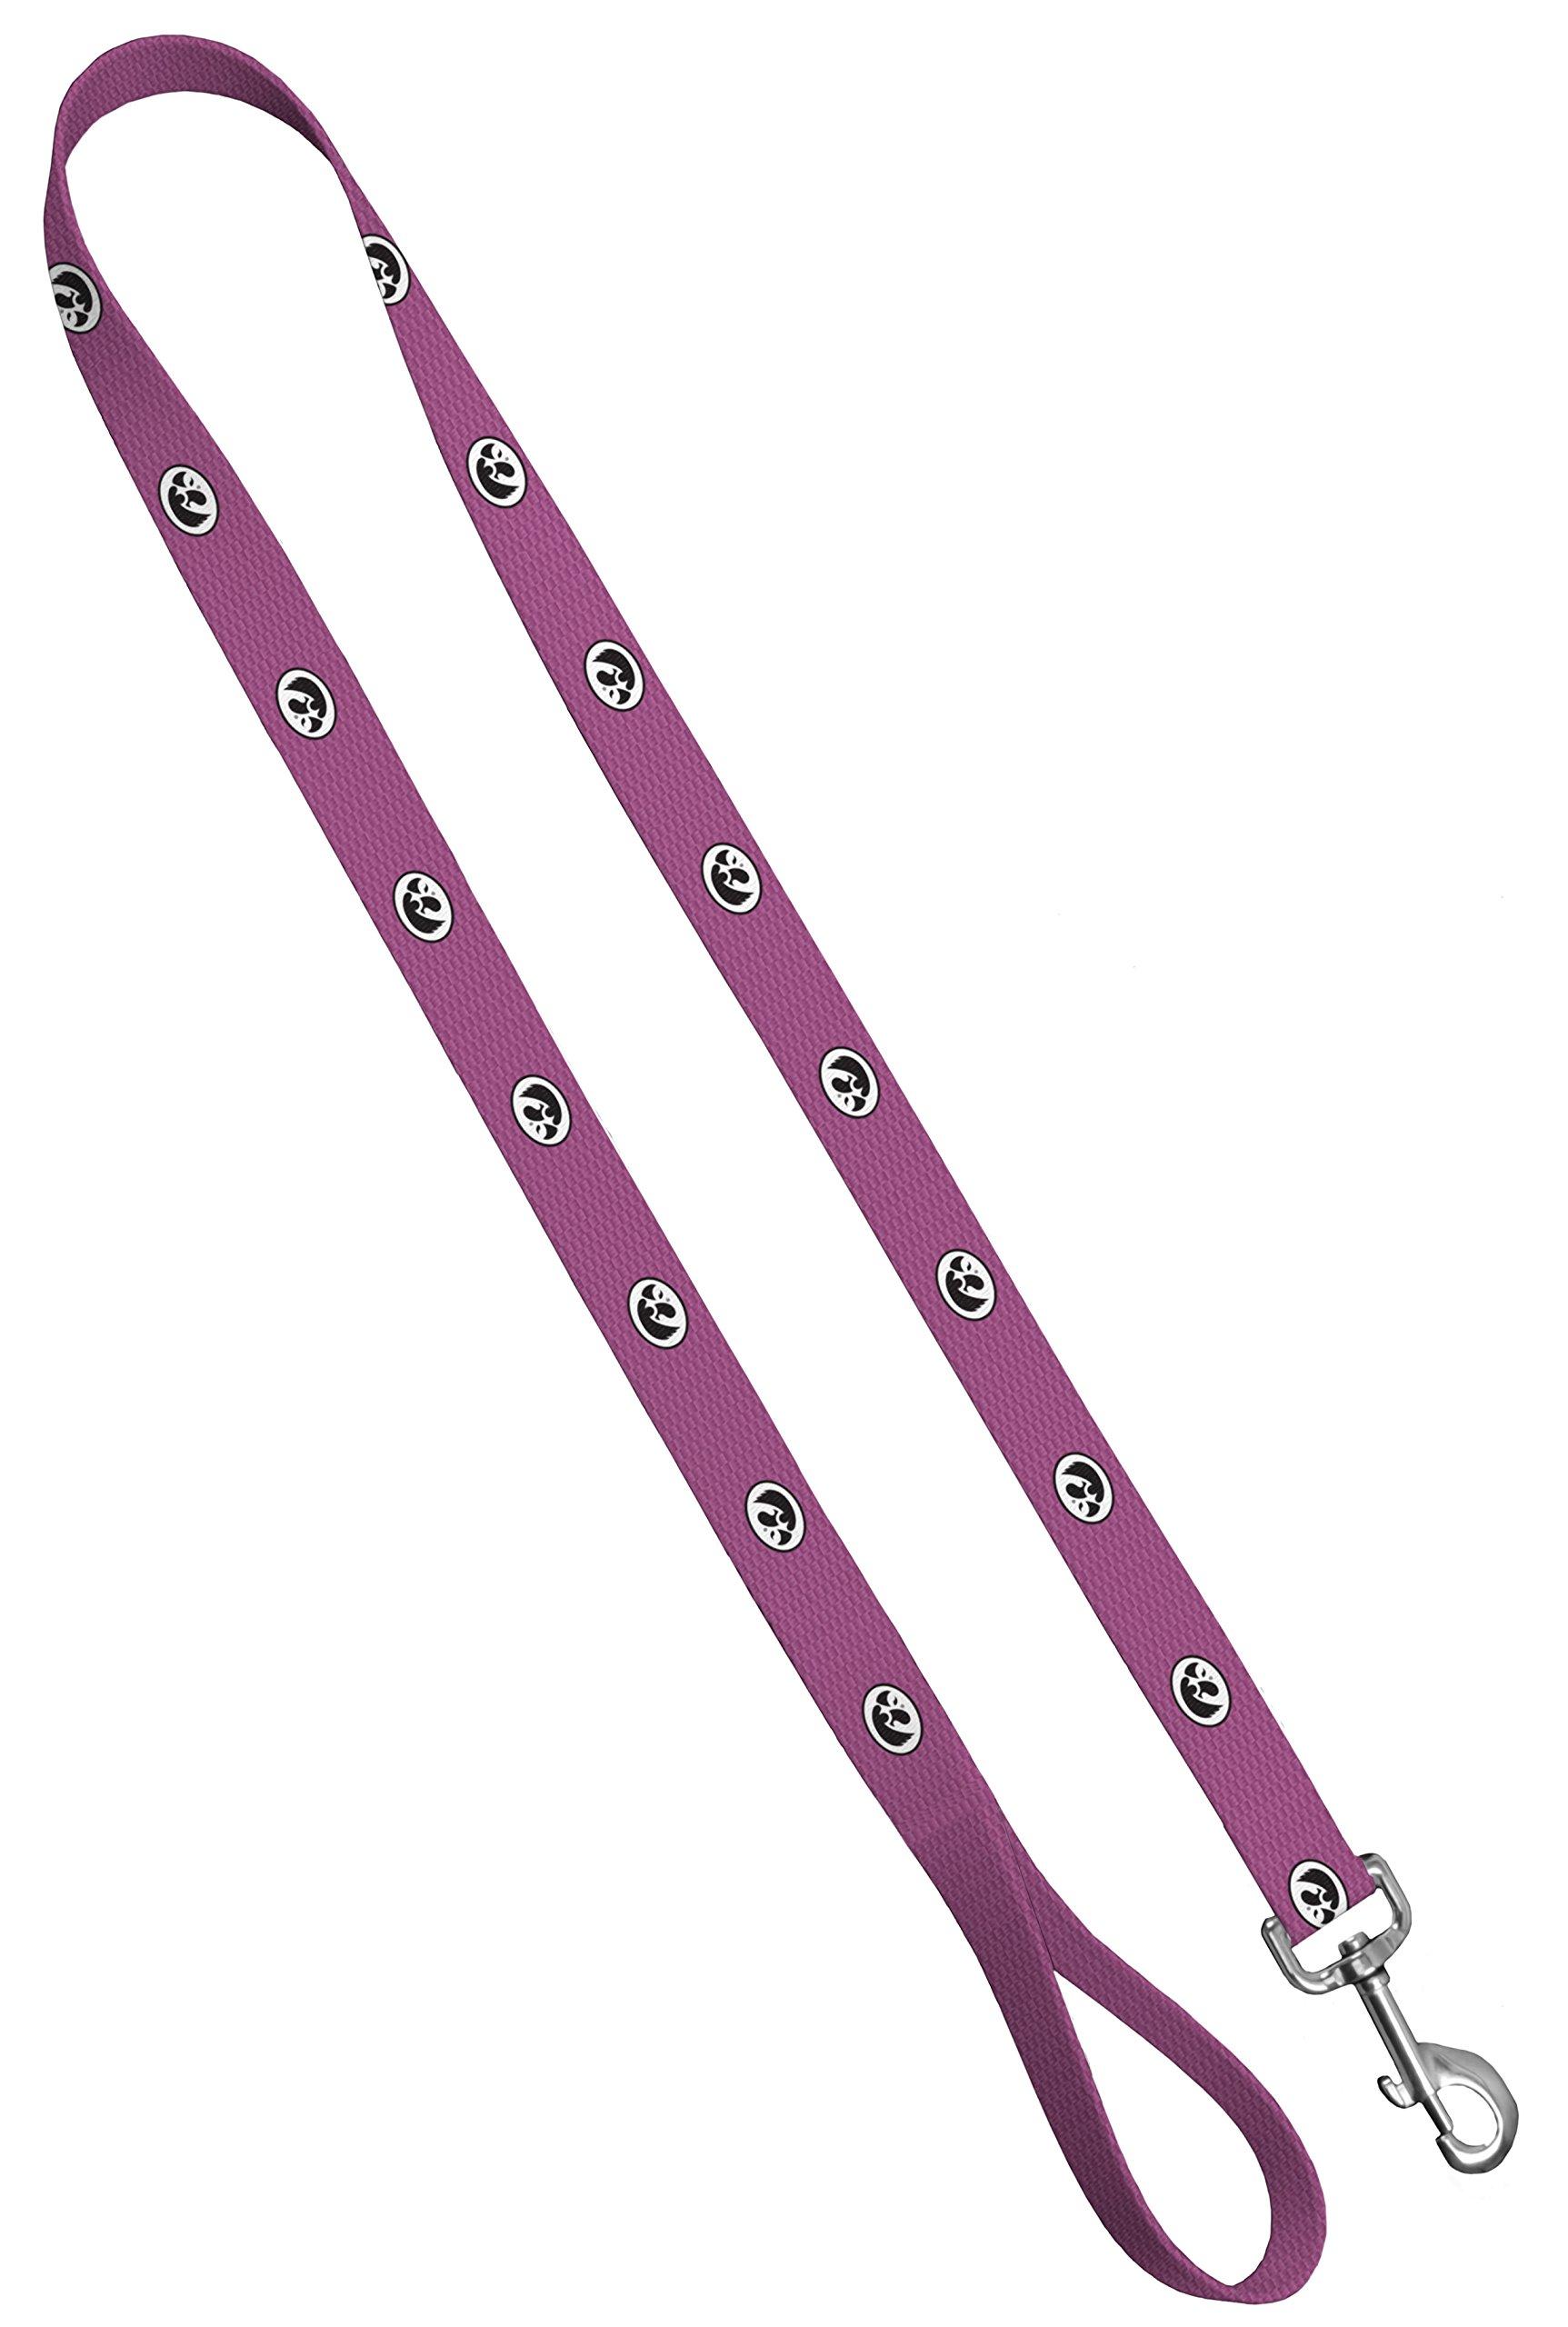 Moose Pet Wear Dog Leash - University of Iowa Hawkeyes Pet Leash, Made in the USA - 1 Inch Wide x 6 Feet Long, Pink Carbon Fiber